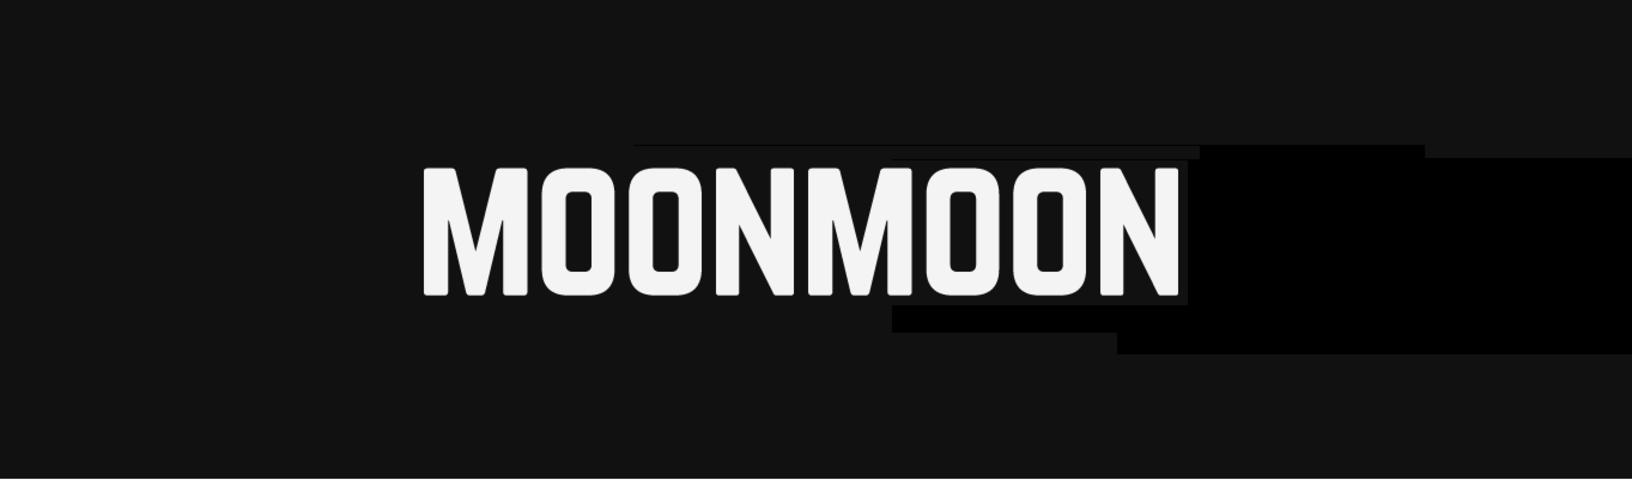 MOONMOON_OW